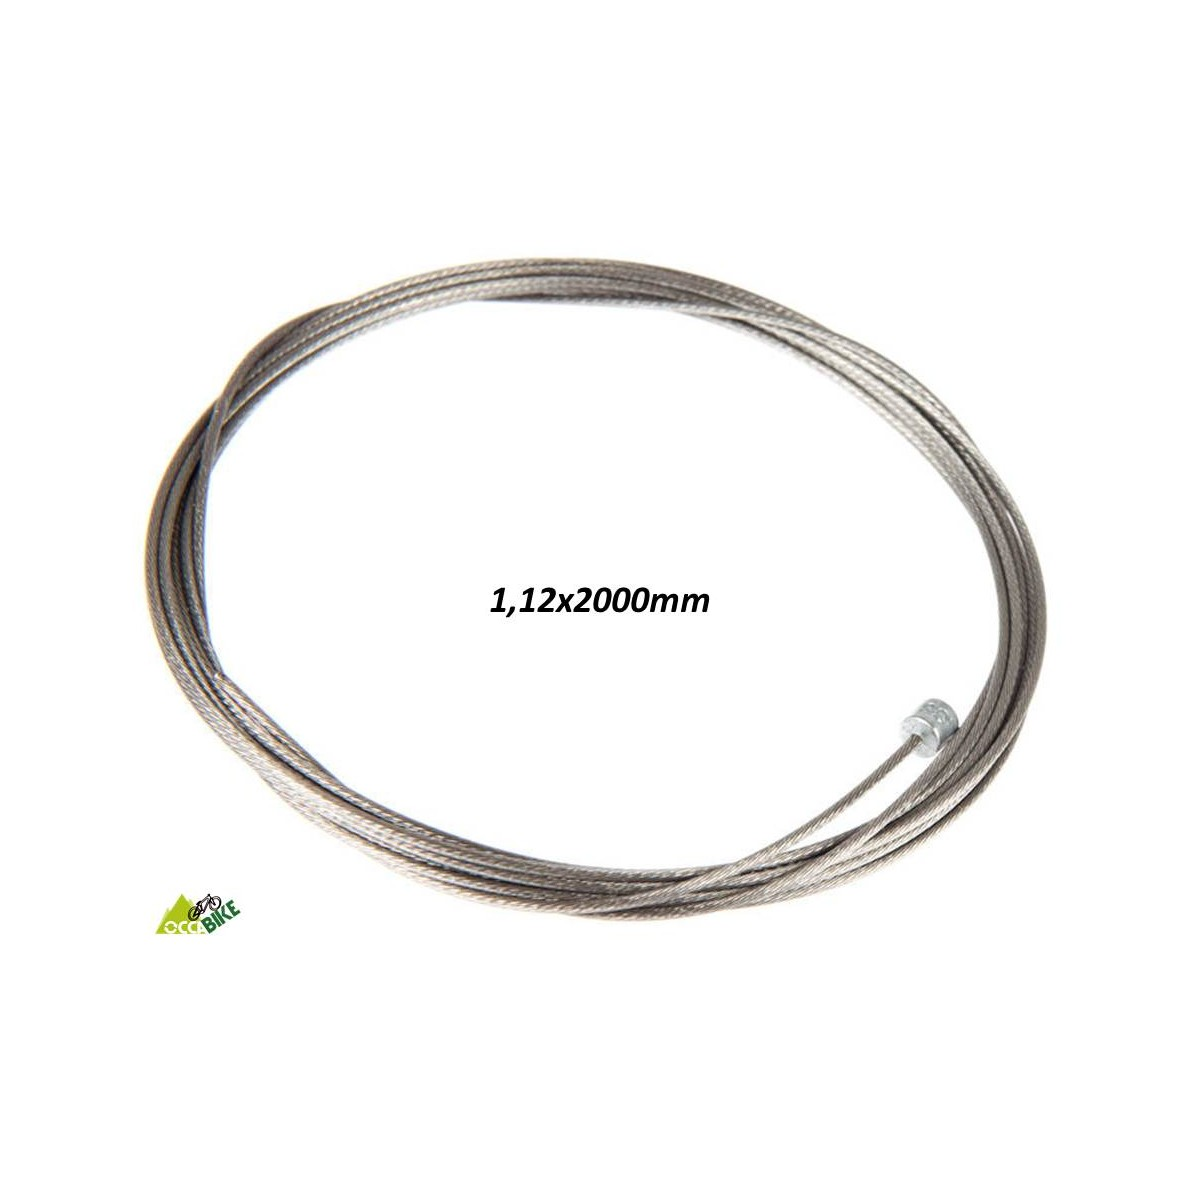 cable de derailleur inox 2m30 clark/'s neuf